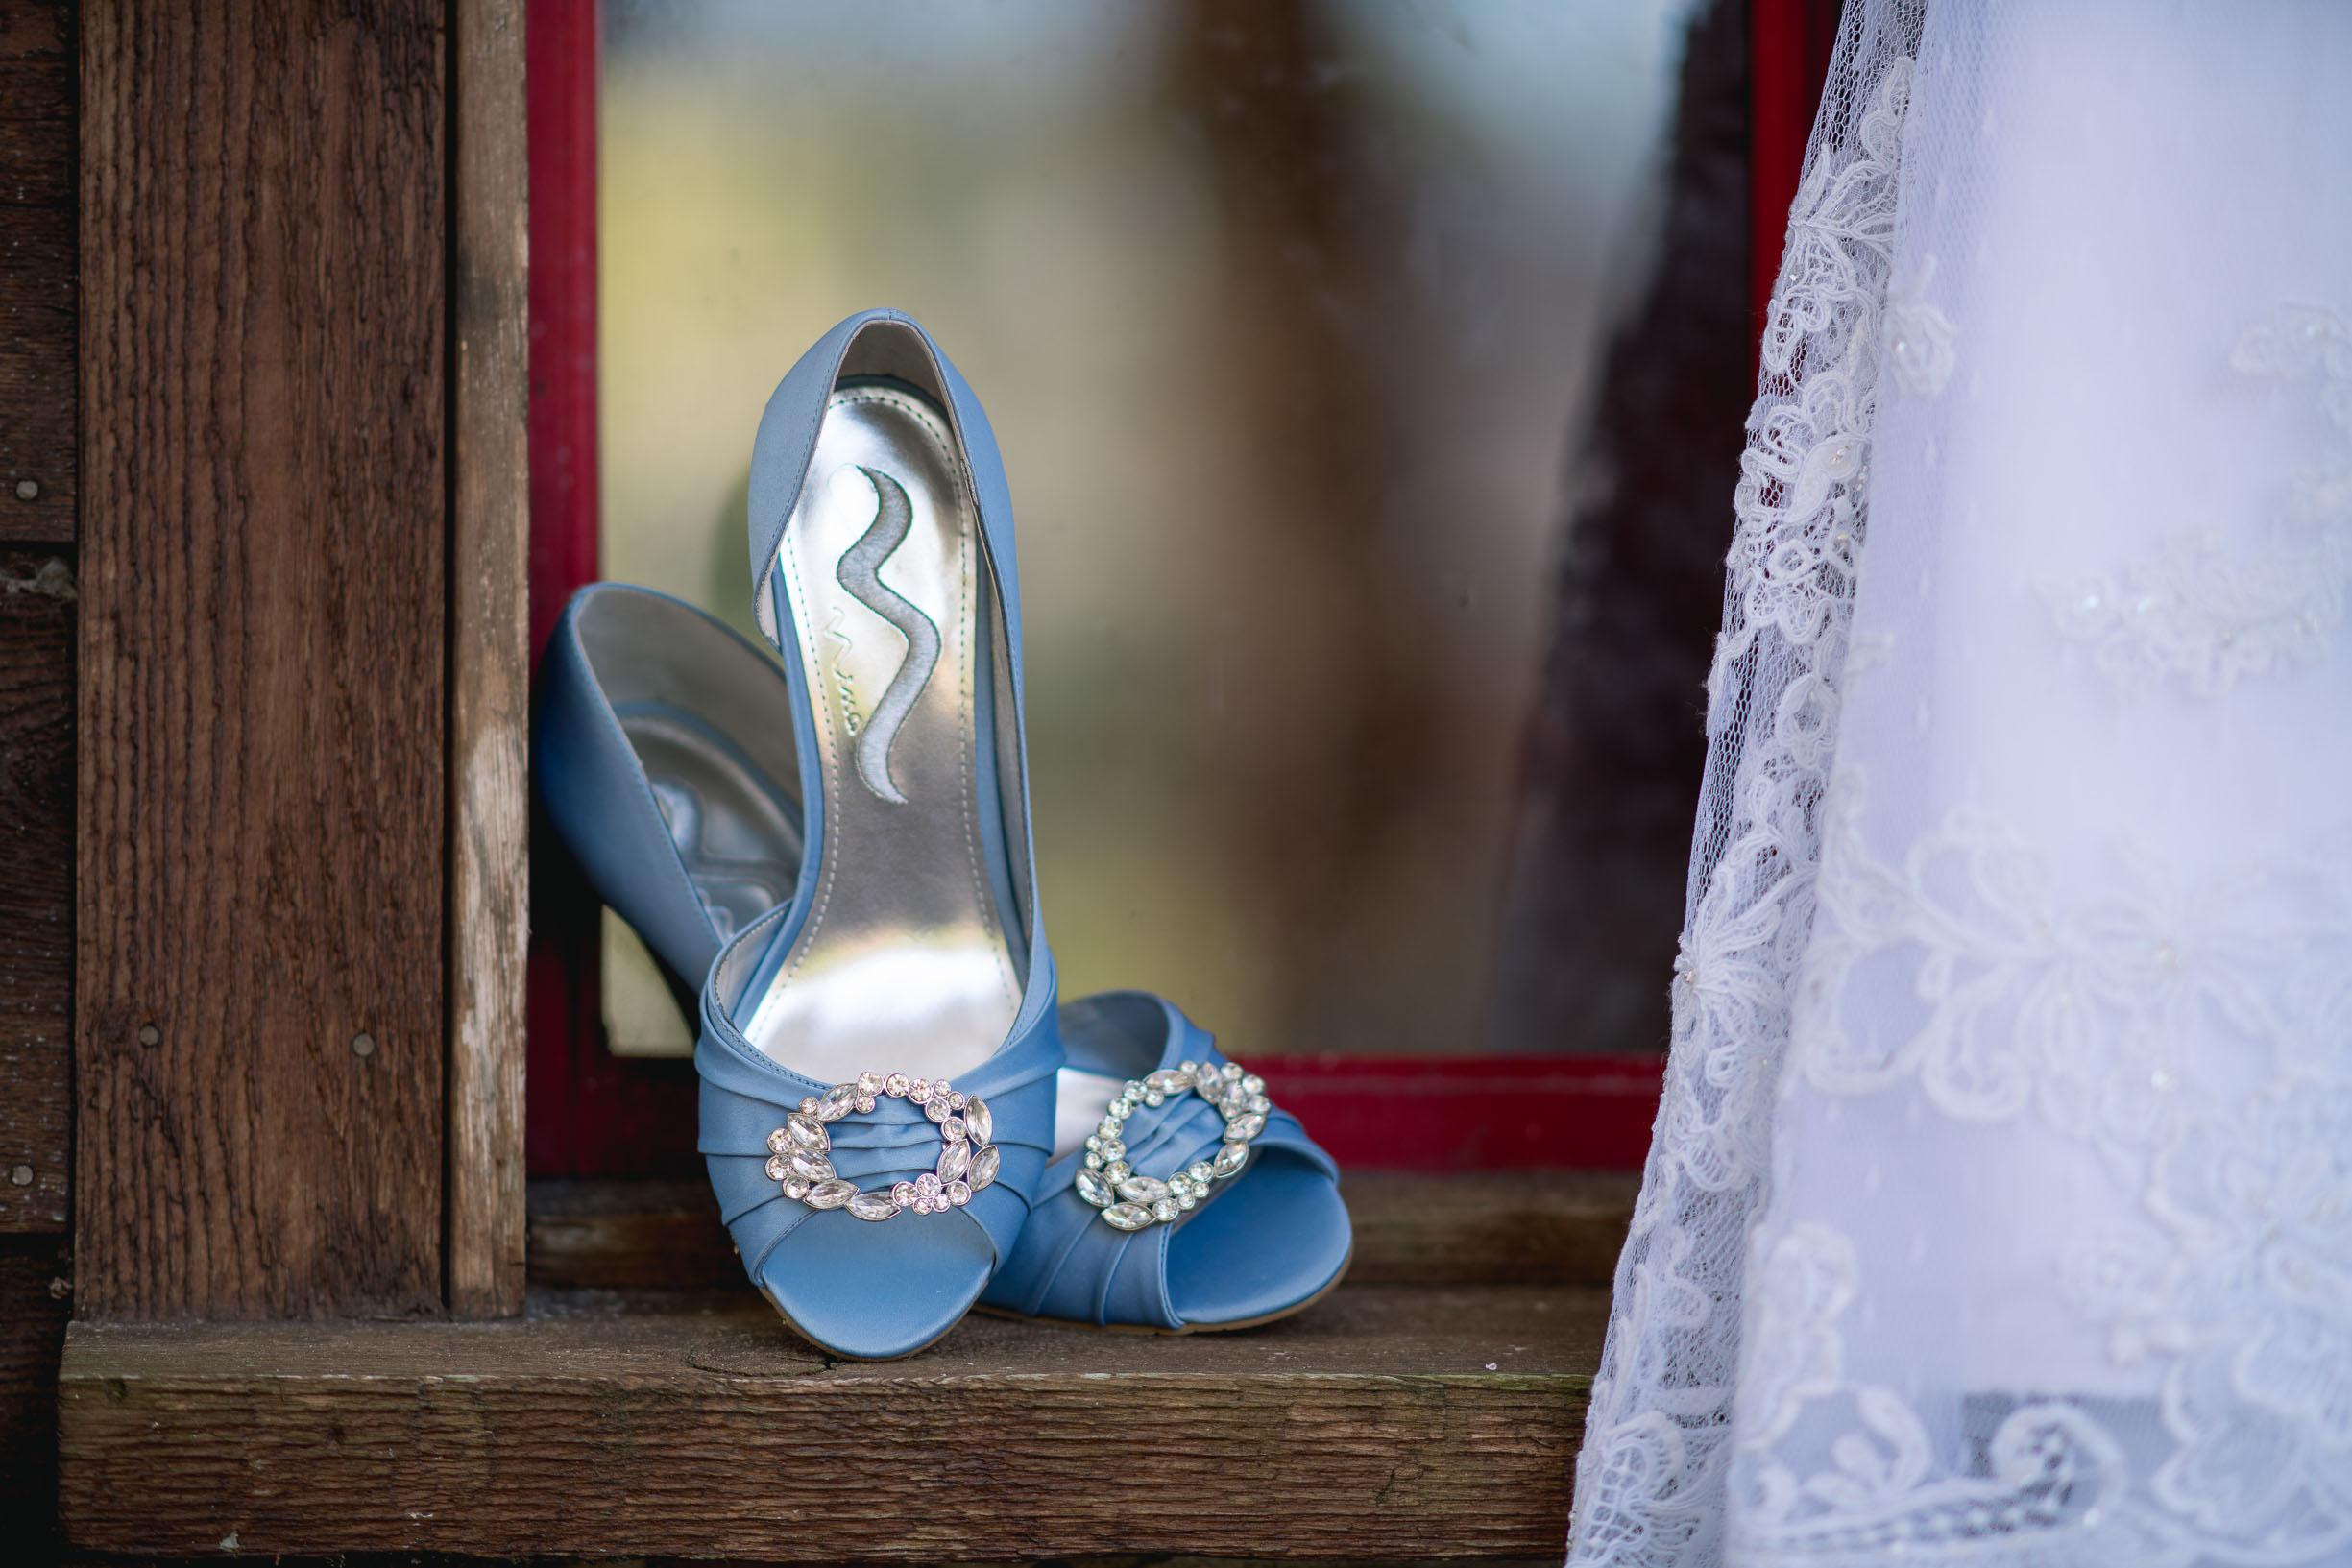 006Portland Wedding Photographer timothy capp.jpg